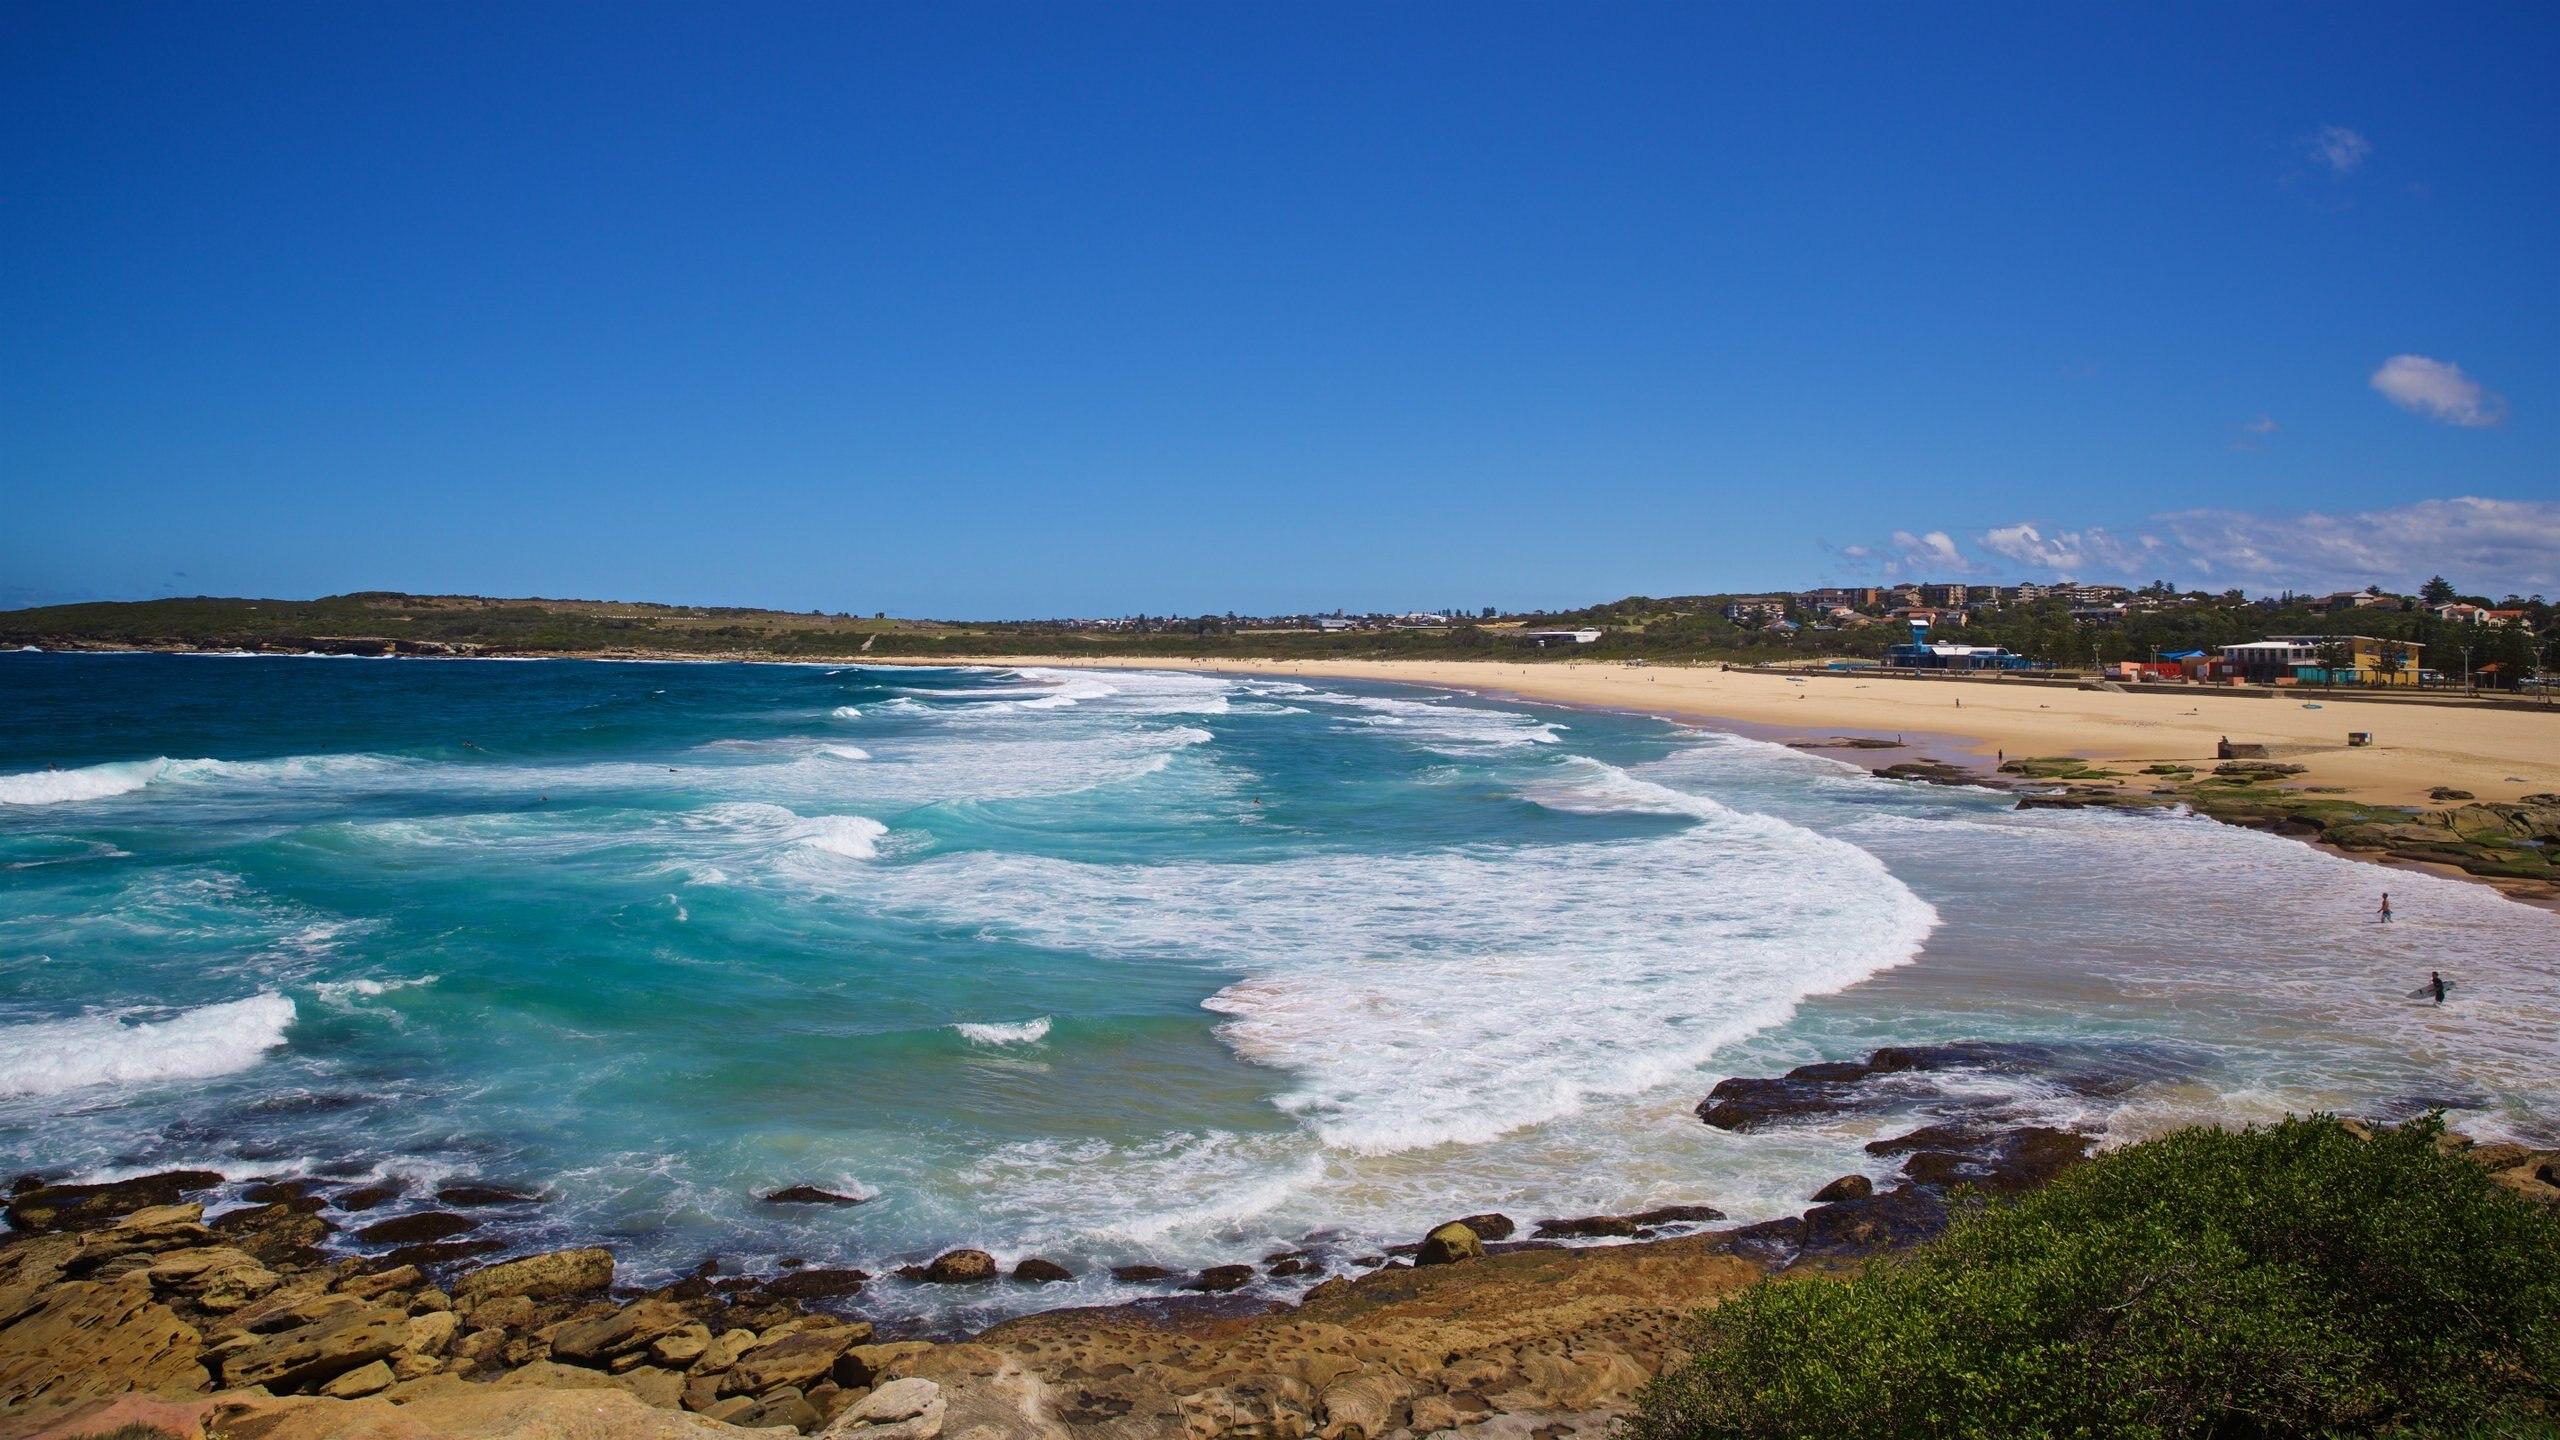 Maroubra, Sydney, New South Wales, Australia